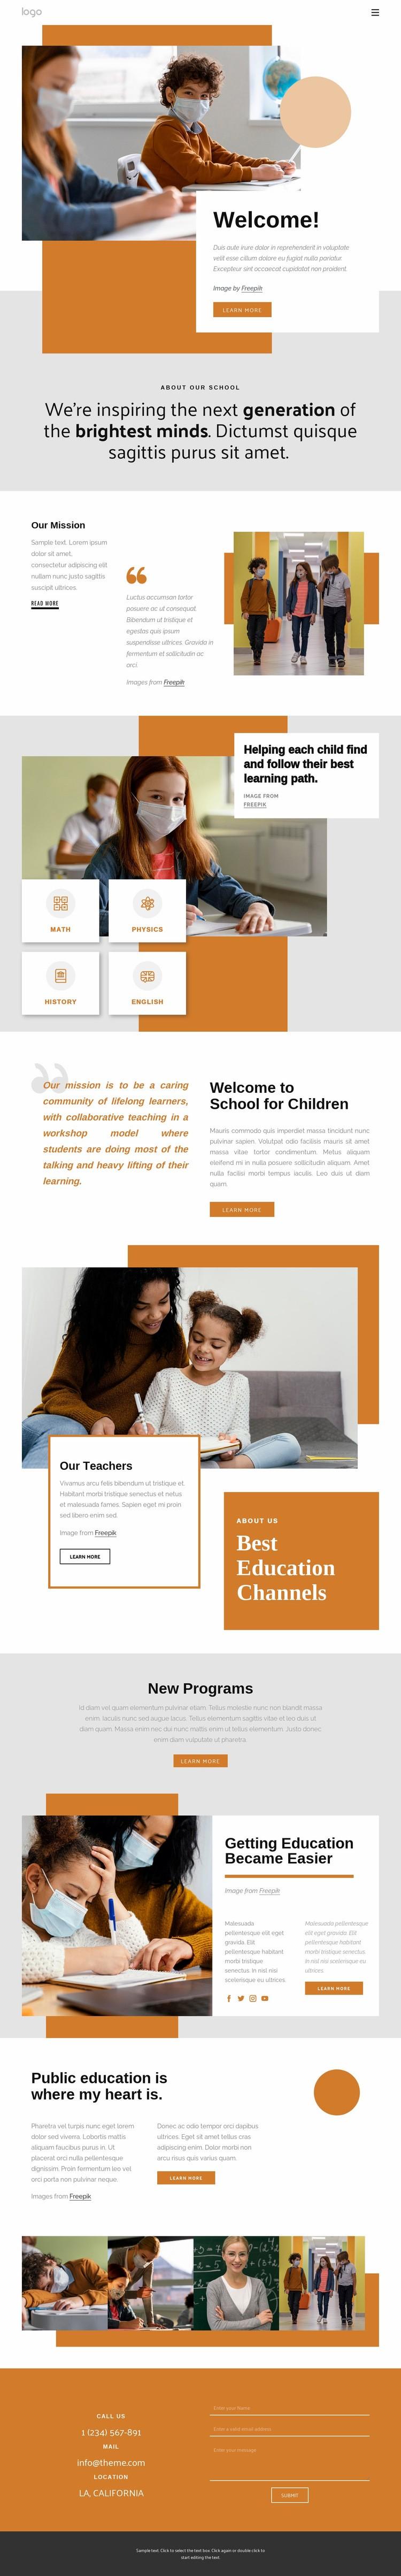 Primary school Web Page Designer